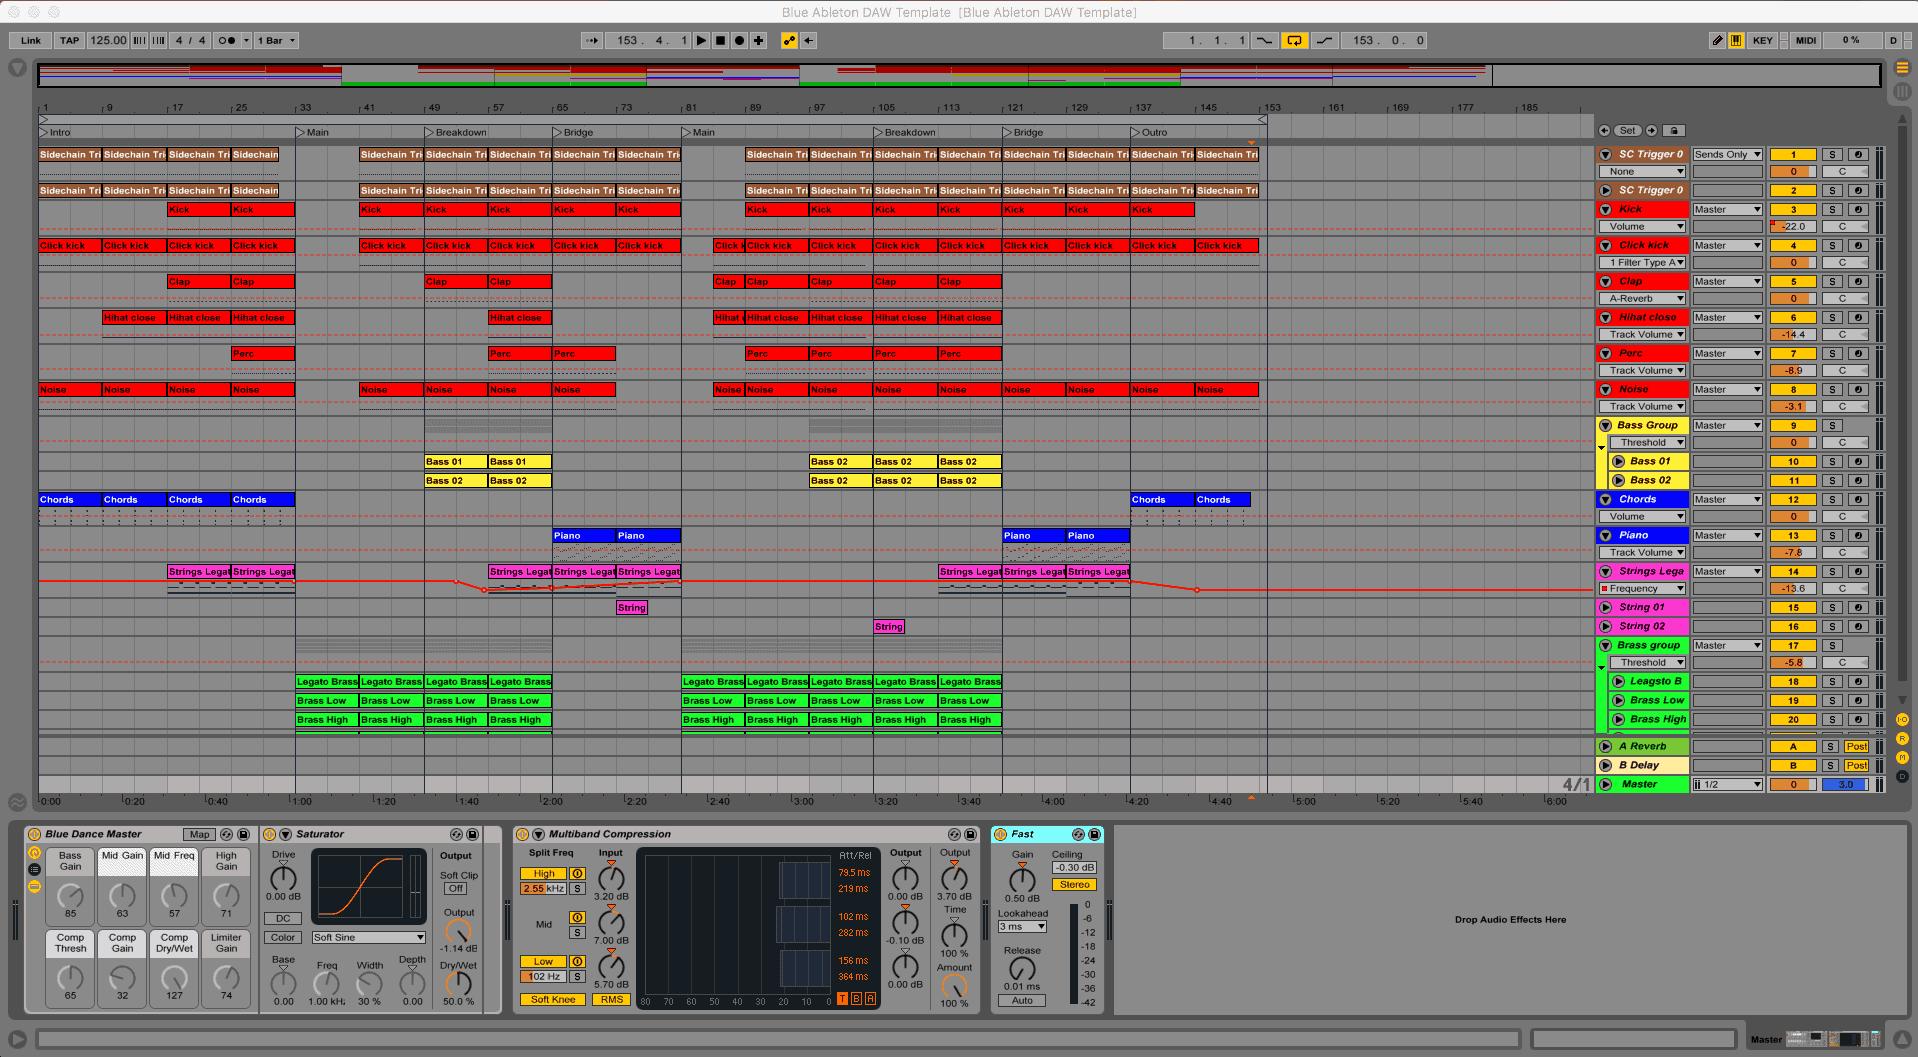 Blue Ableton Live Template